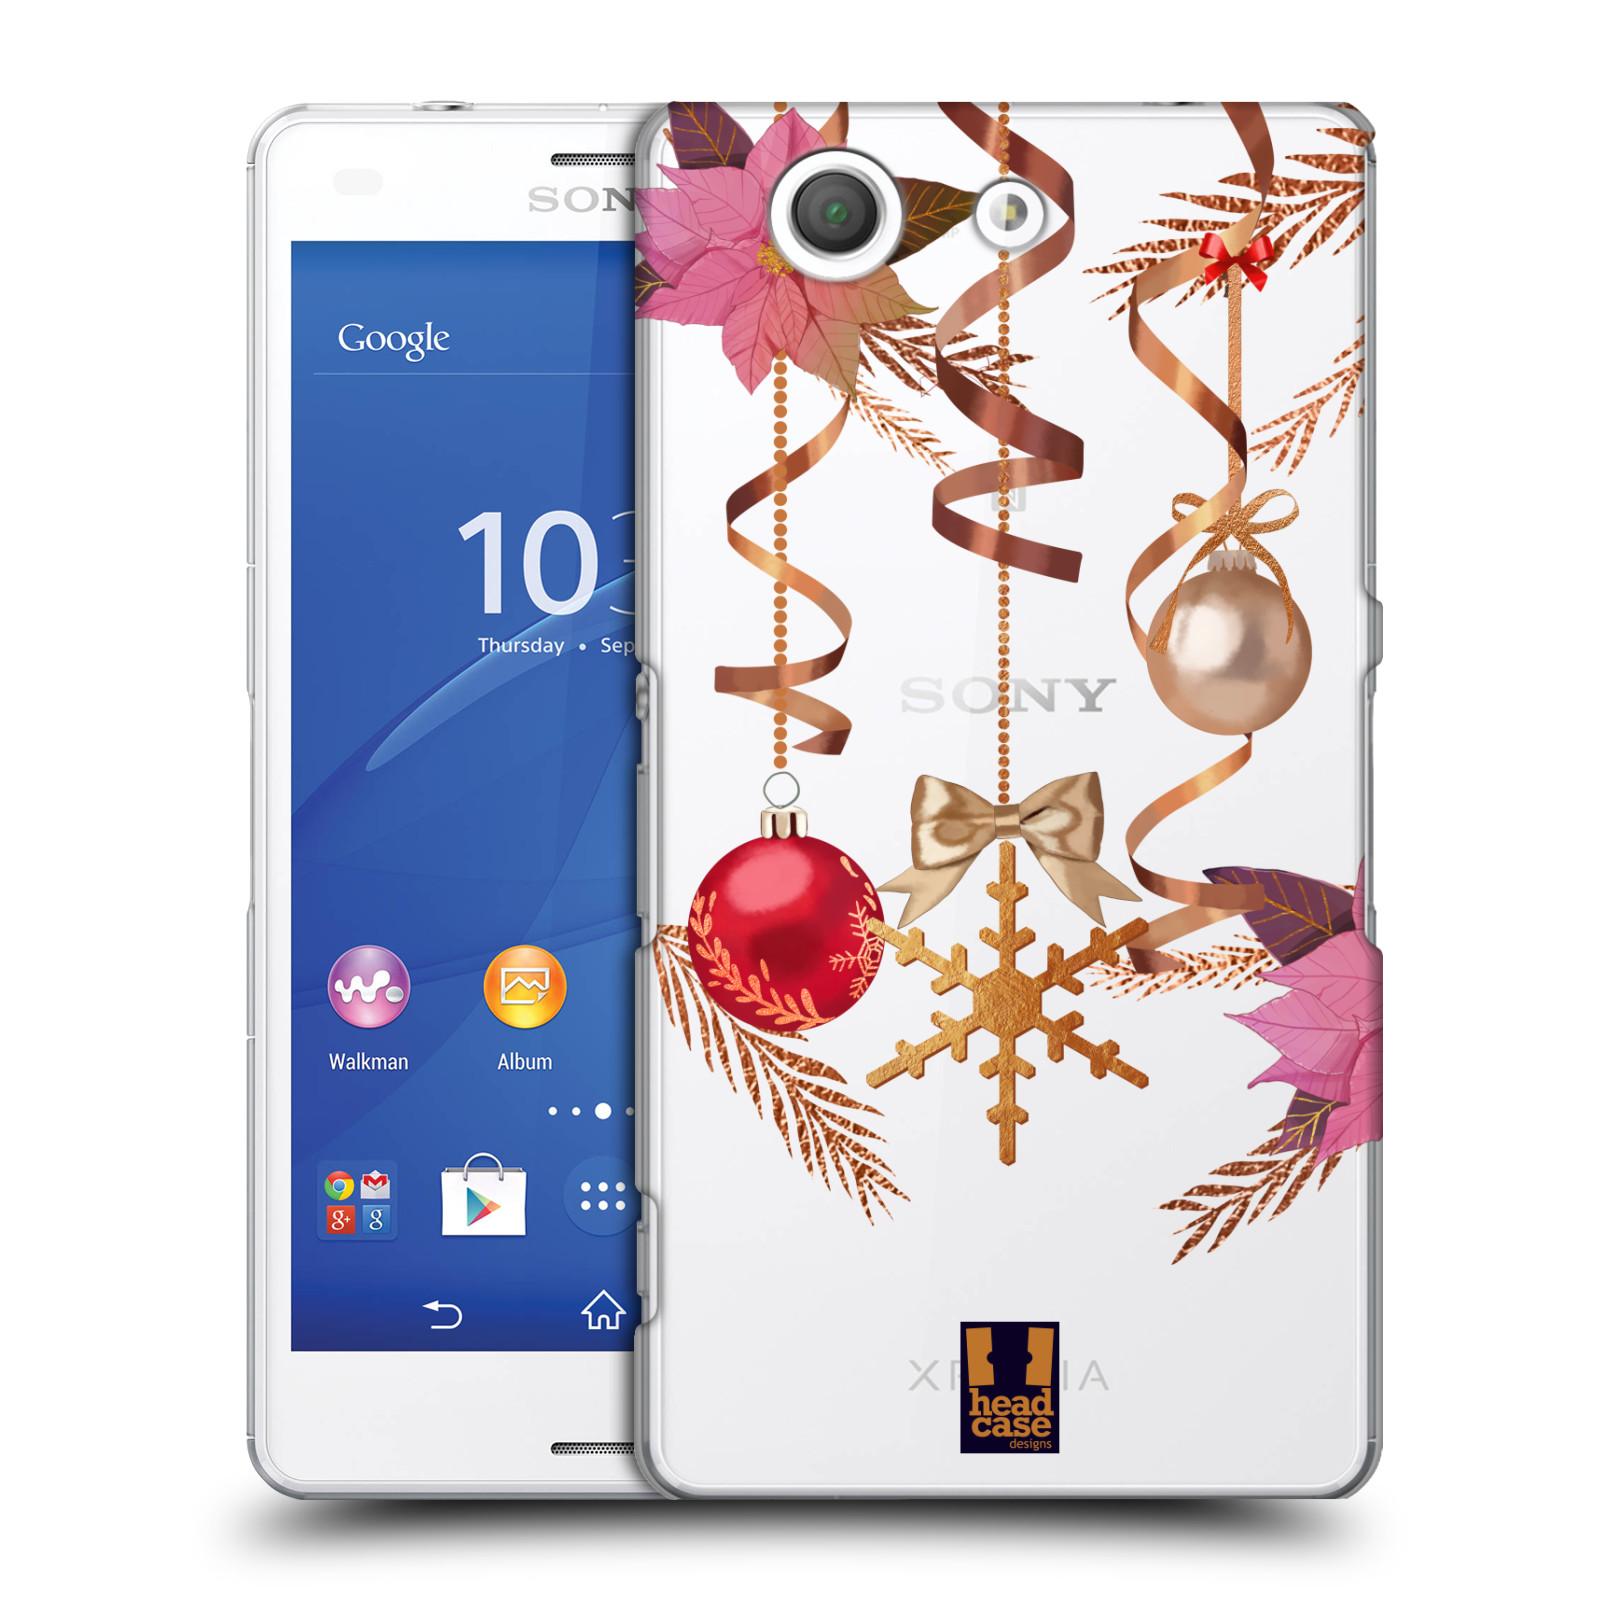 Plastové pouzdro na mobil Sony Xperia Z3 Compact D5803 - Head Case - Vločka a vánoční ozdoby